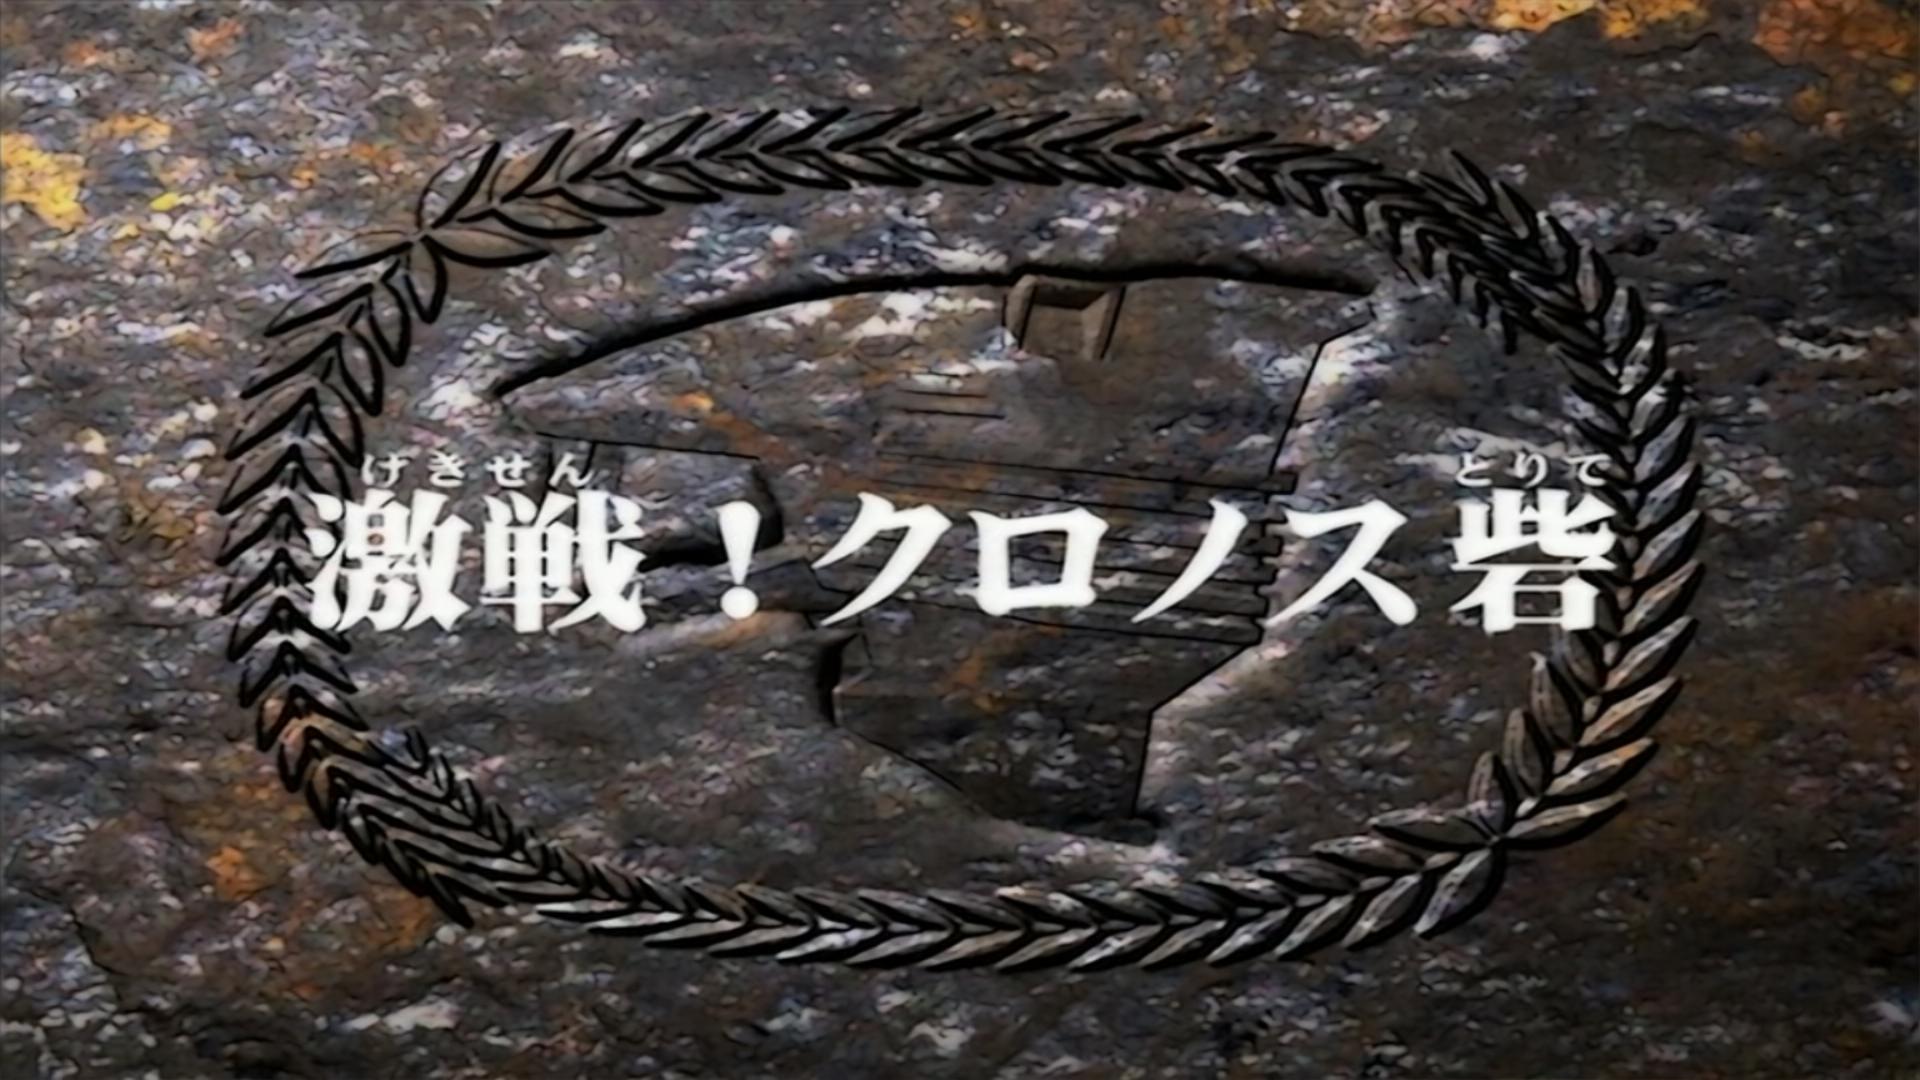 Zoids: Chaotic Century Episode 13